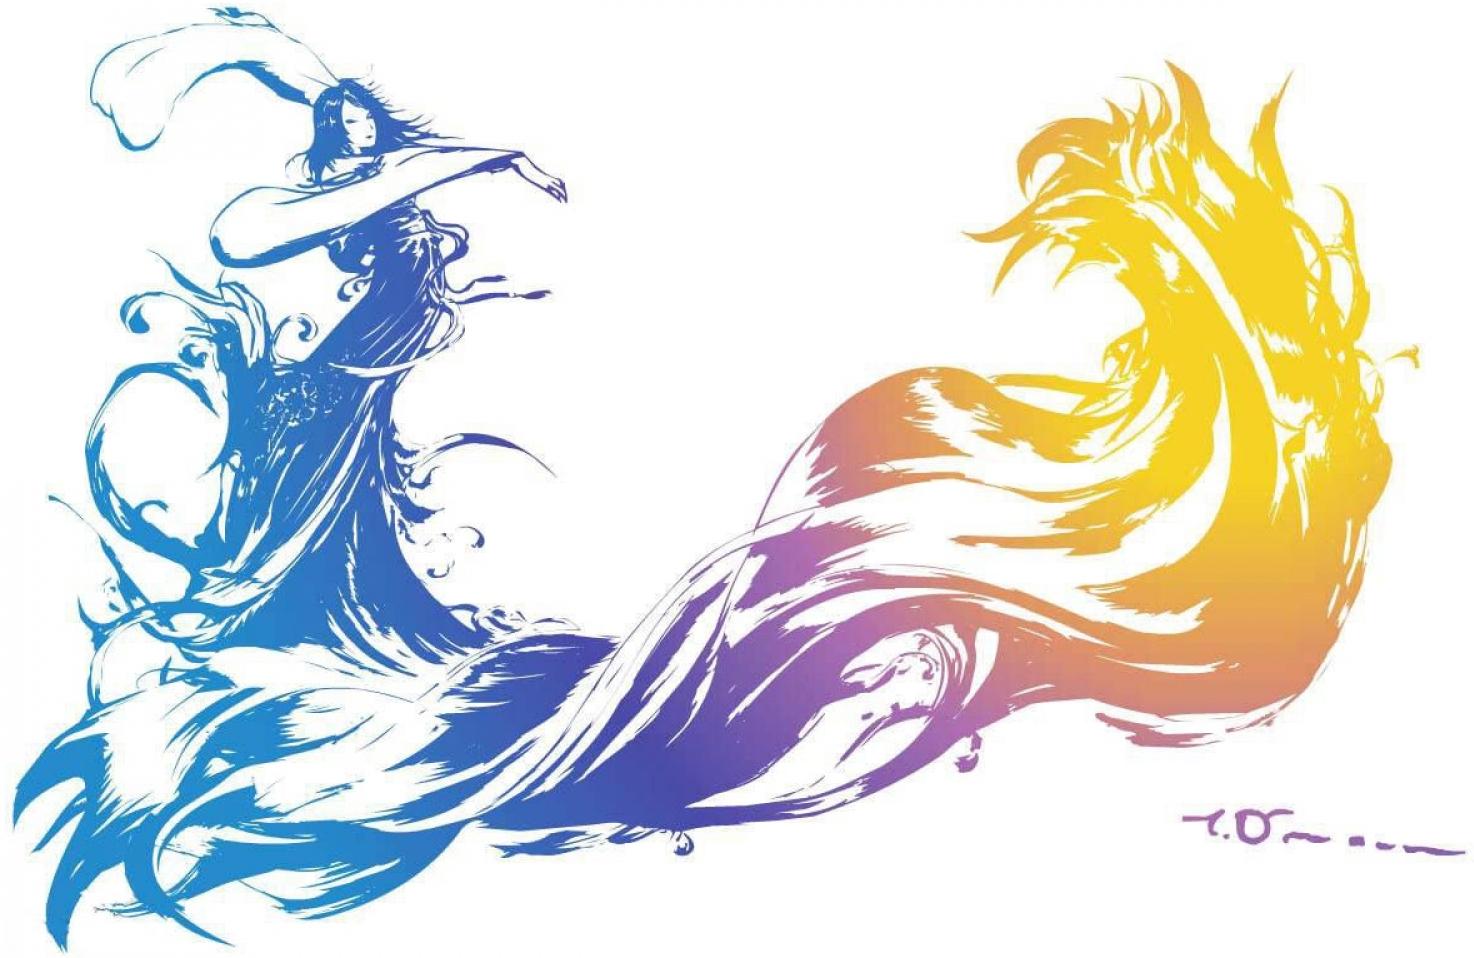 Final fantasy logo art - photo#35